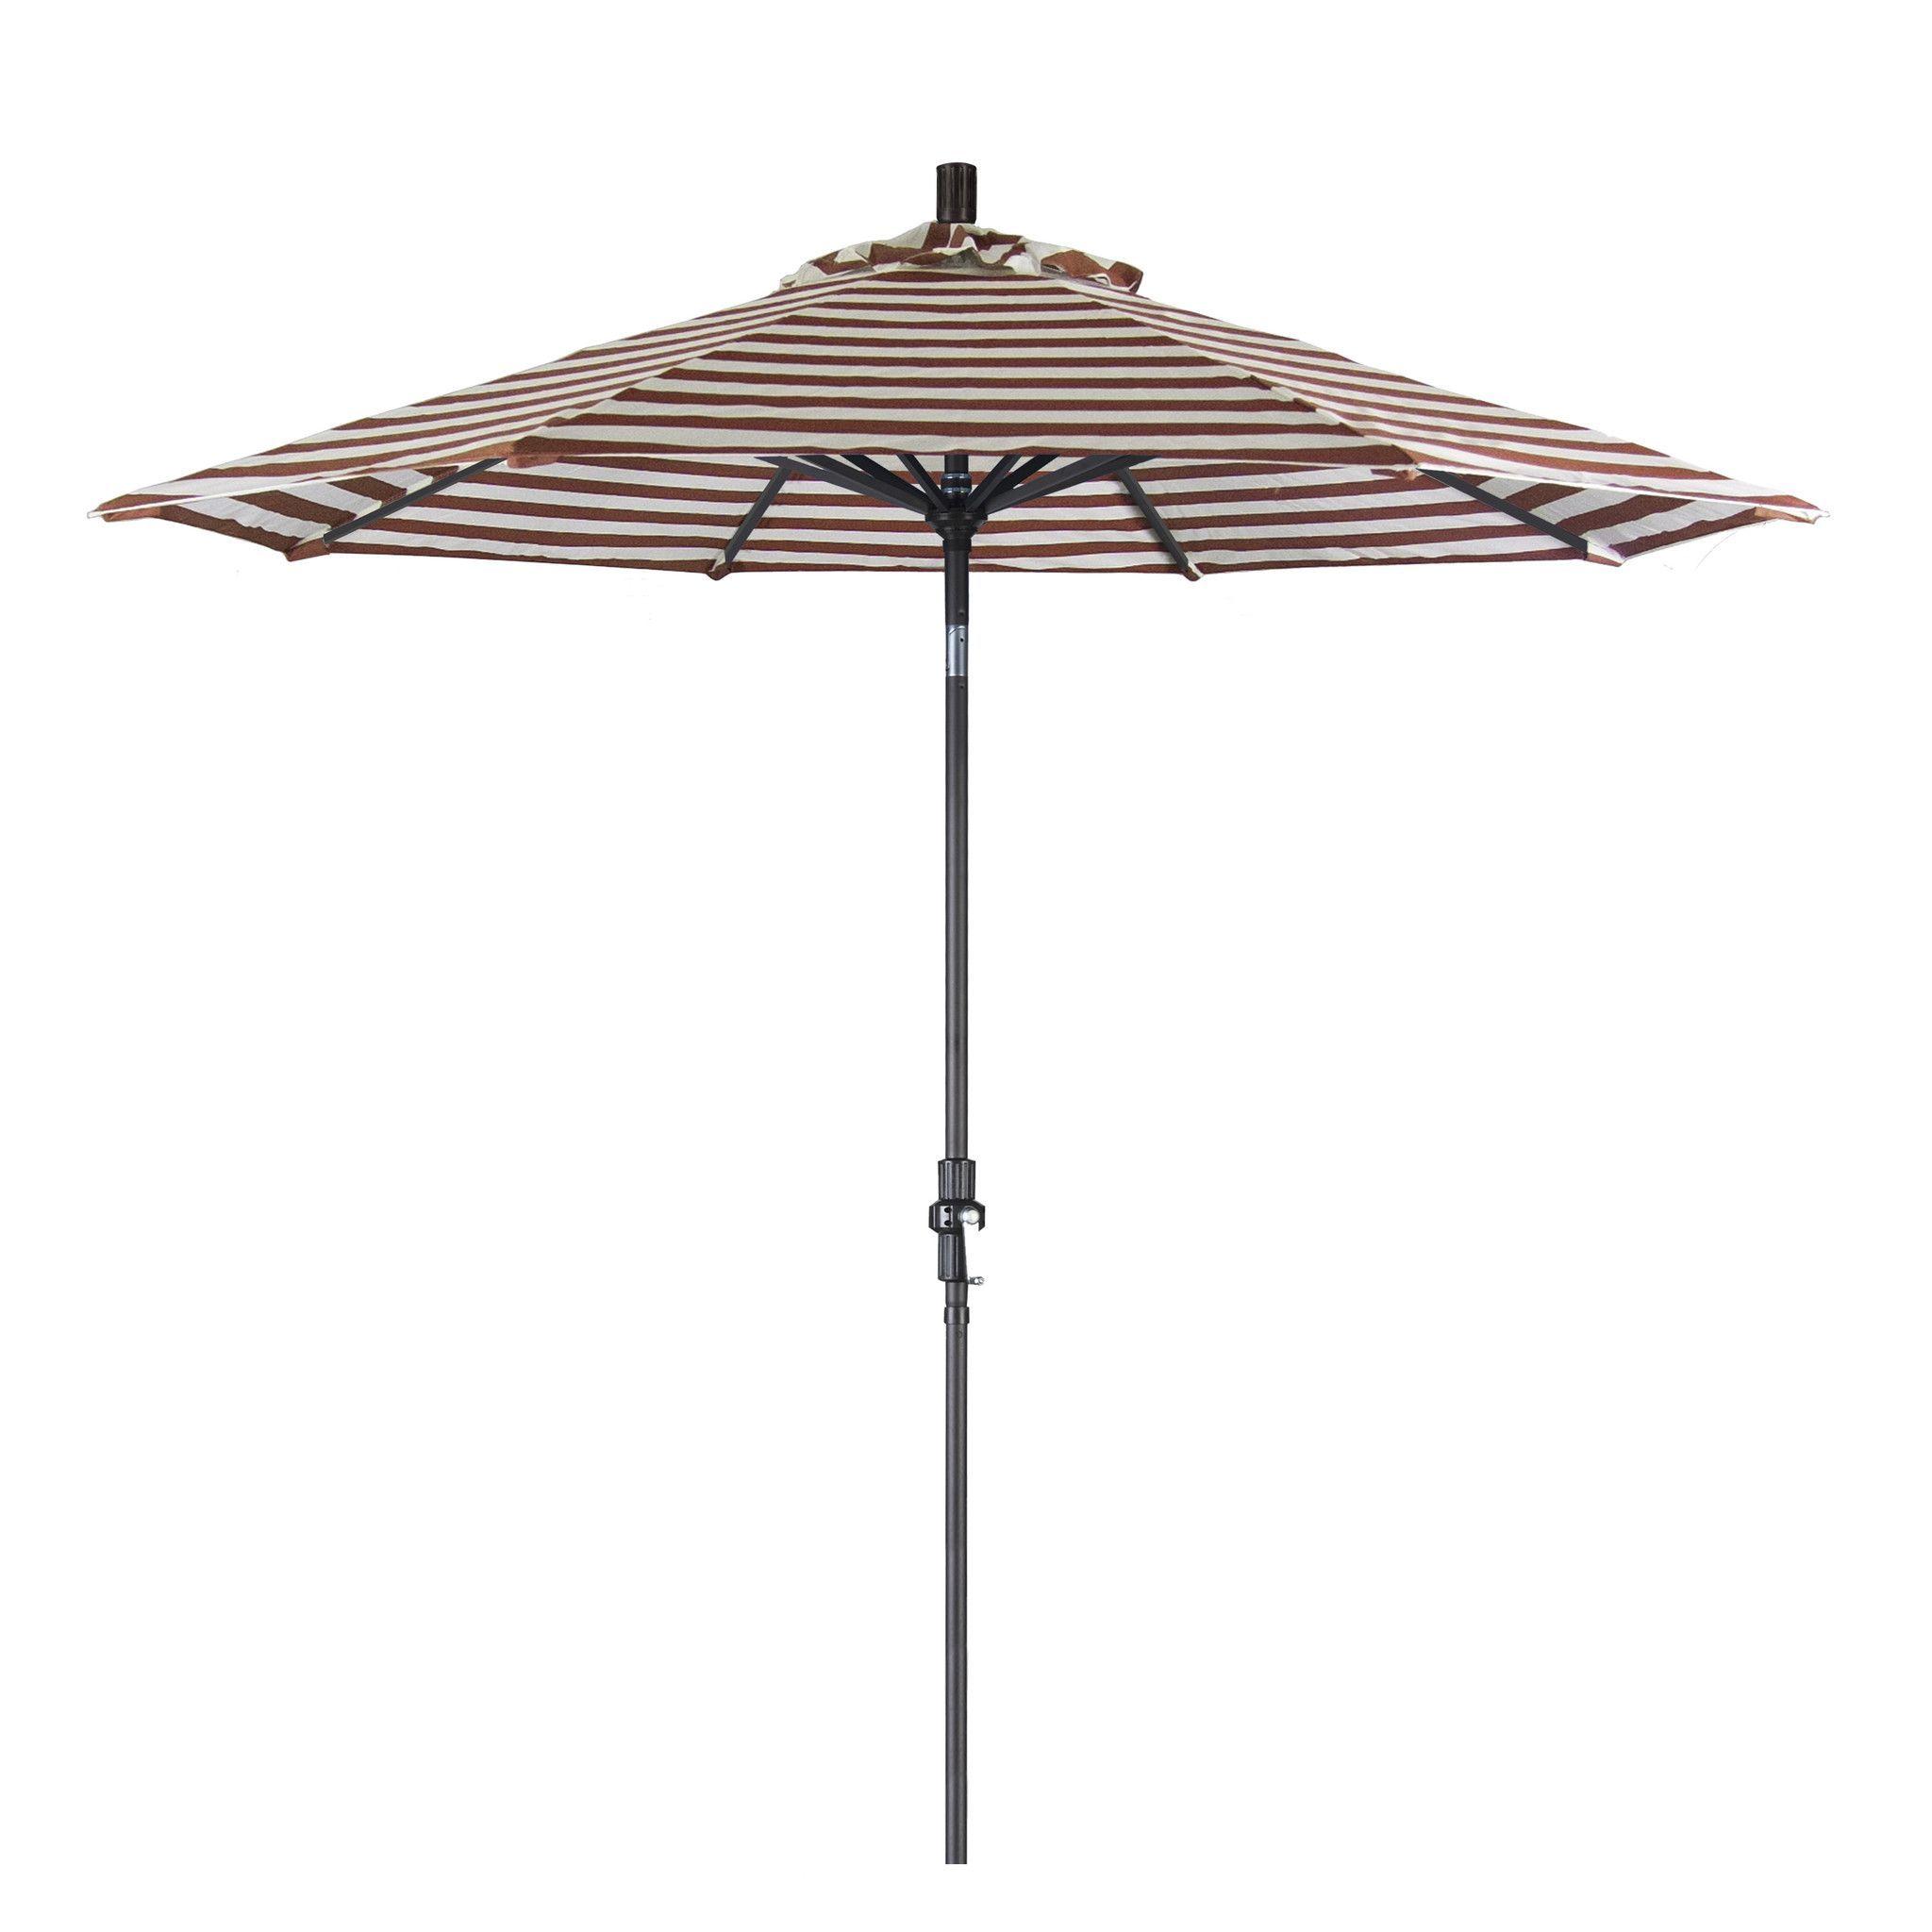 Eclipse Collection 9' Aluminum Market Umbrella Collar Tilt - Matted Black/Olefin/Brick White Cabana Stripe